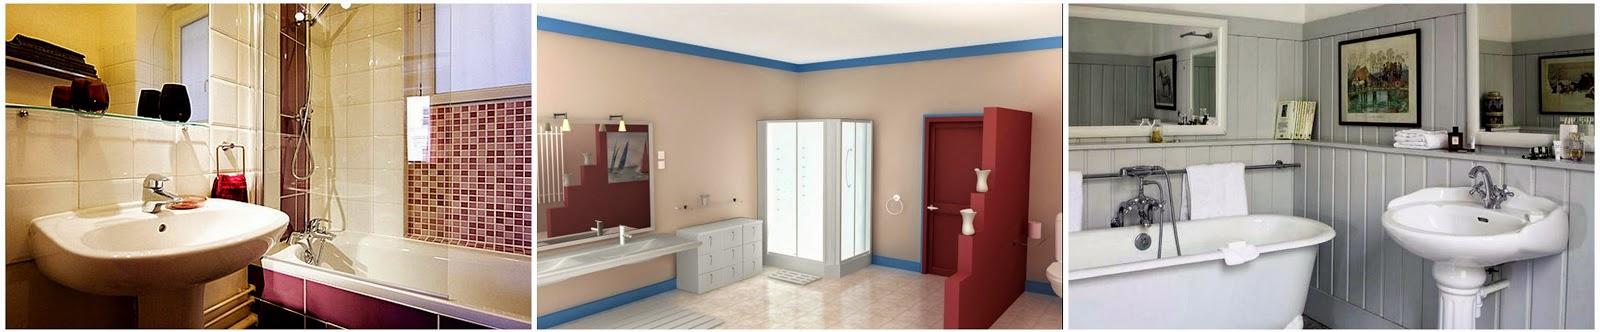 TARIF PEINTRE salle de bain paris